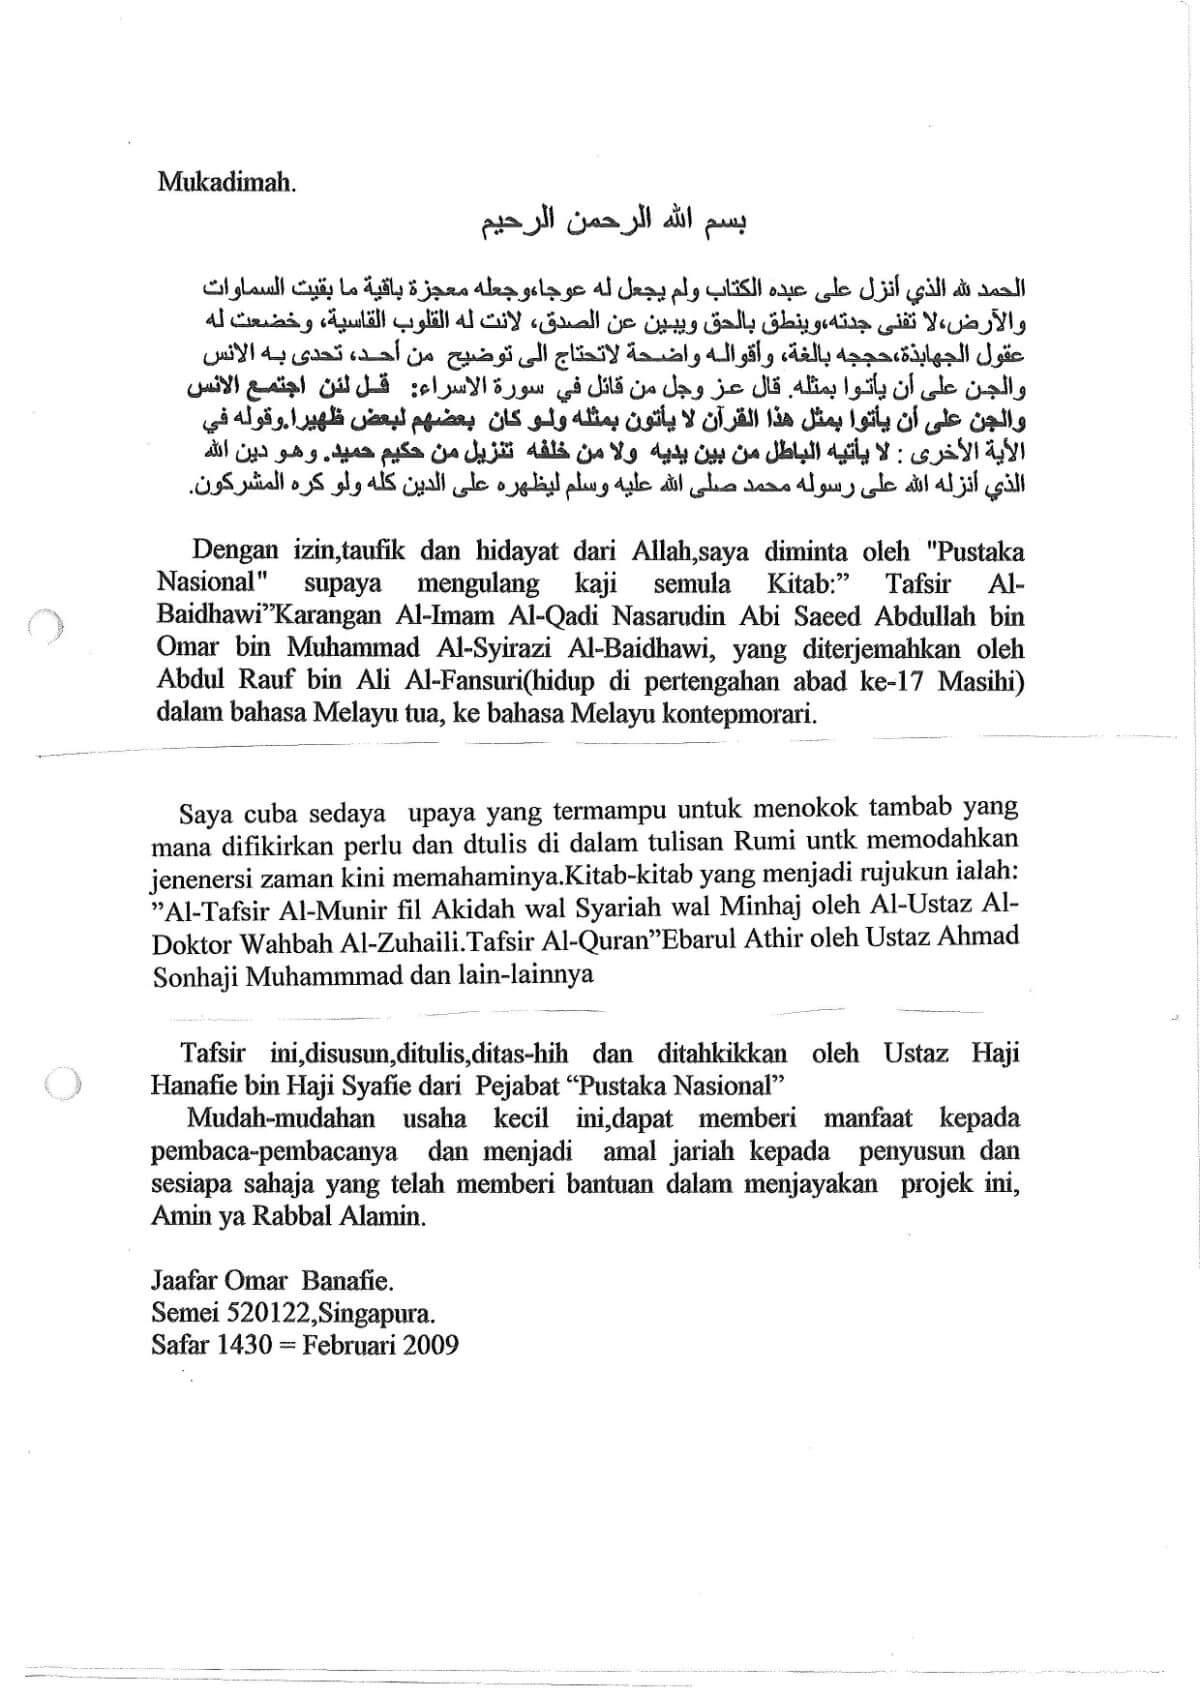 Tafsir Baidhawi- Al Marhum Shaikh Jaafar Banafae_Page_2